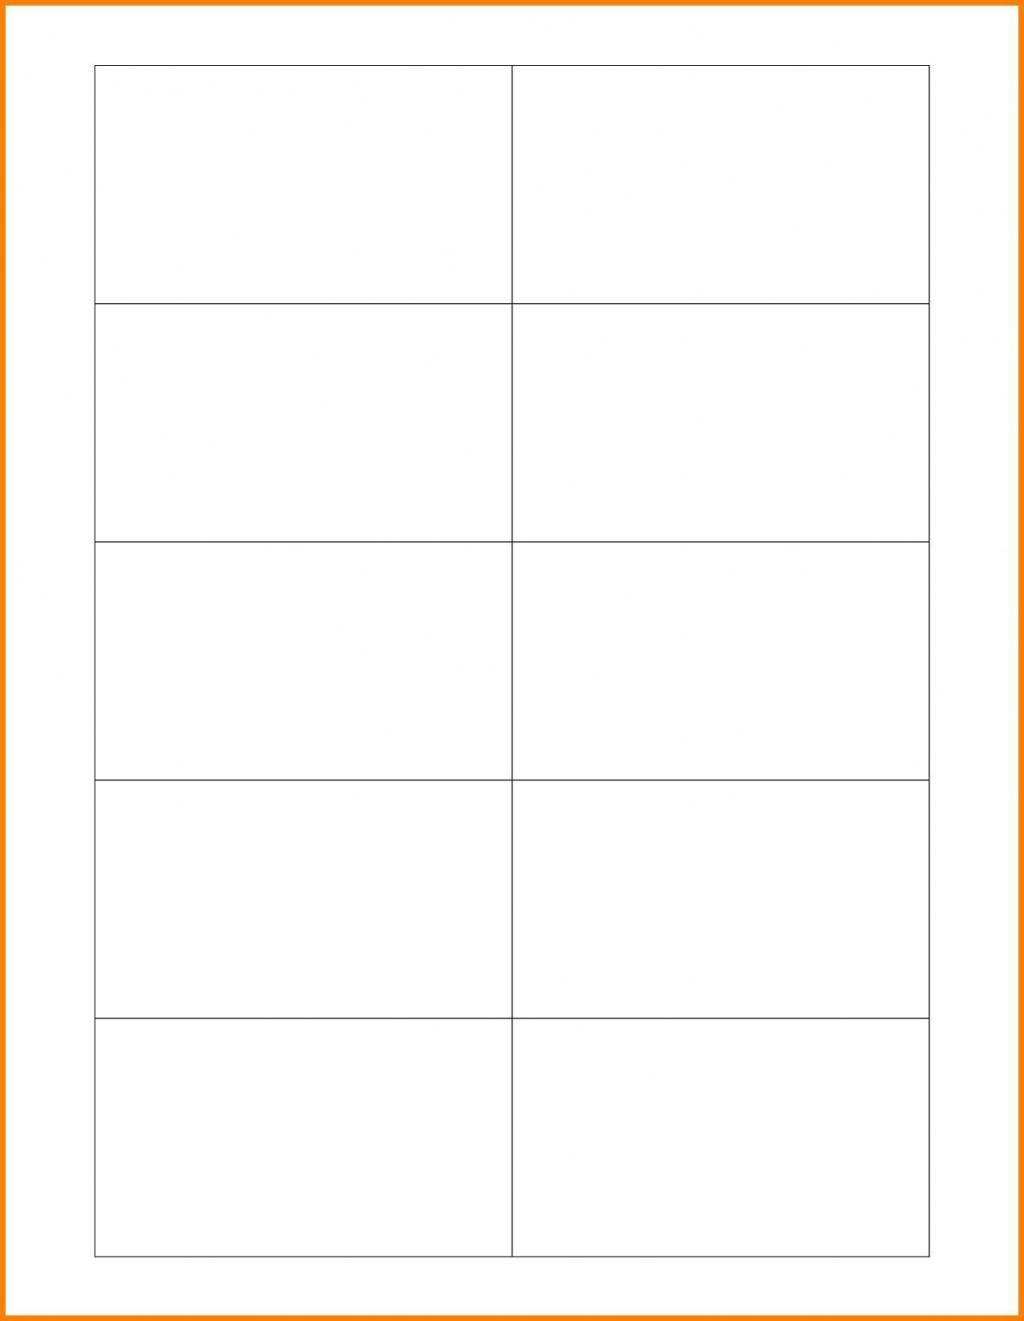 007 Marvelou Free Blank Busines Card Template Image  Templates Online Printable For Word DownloadLarge